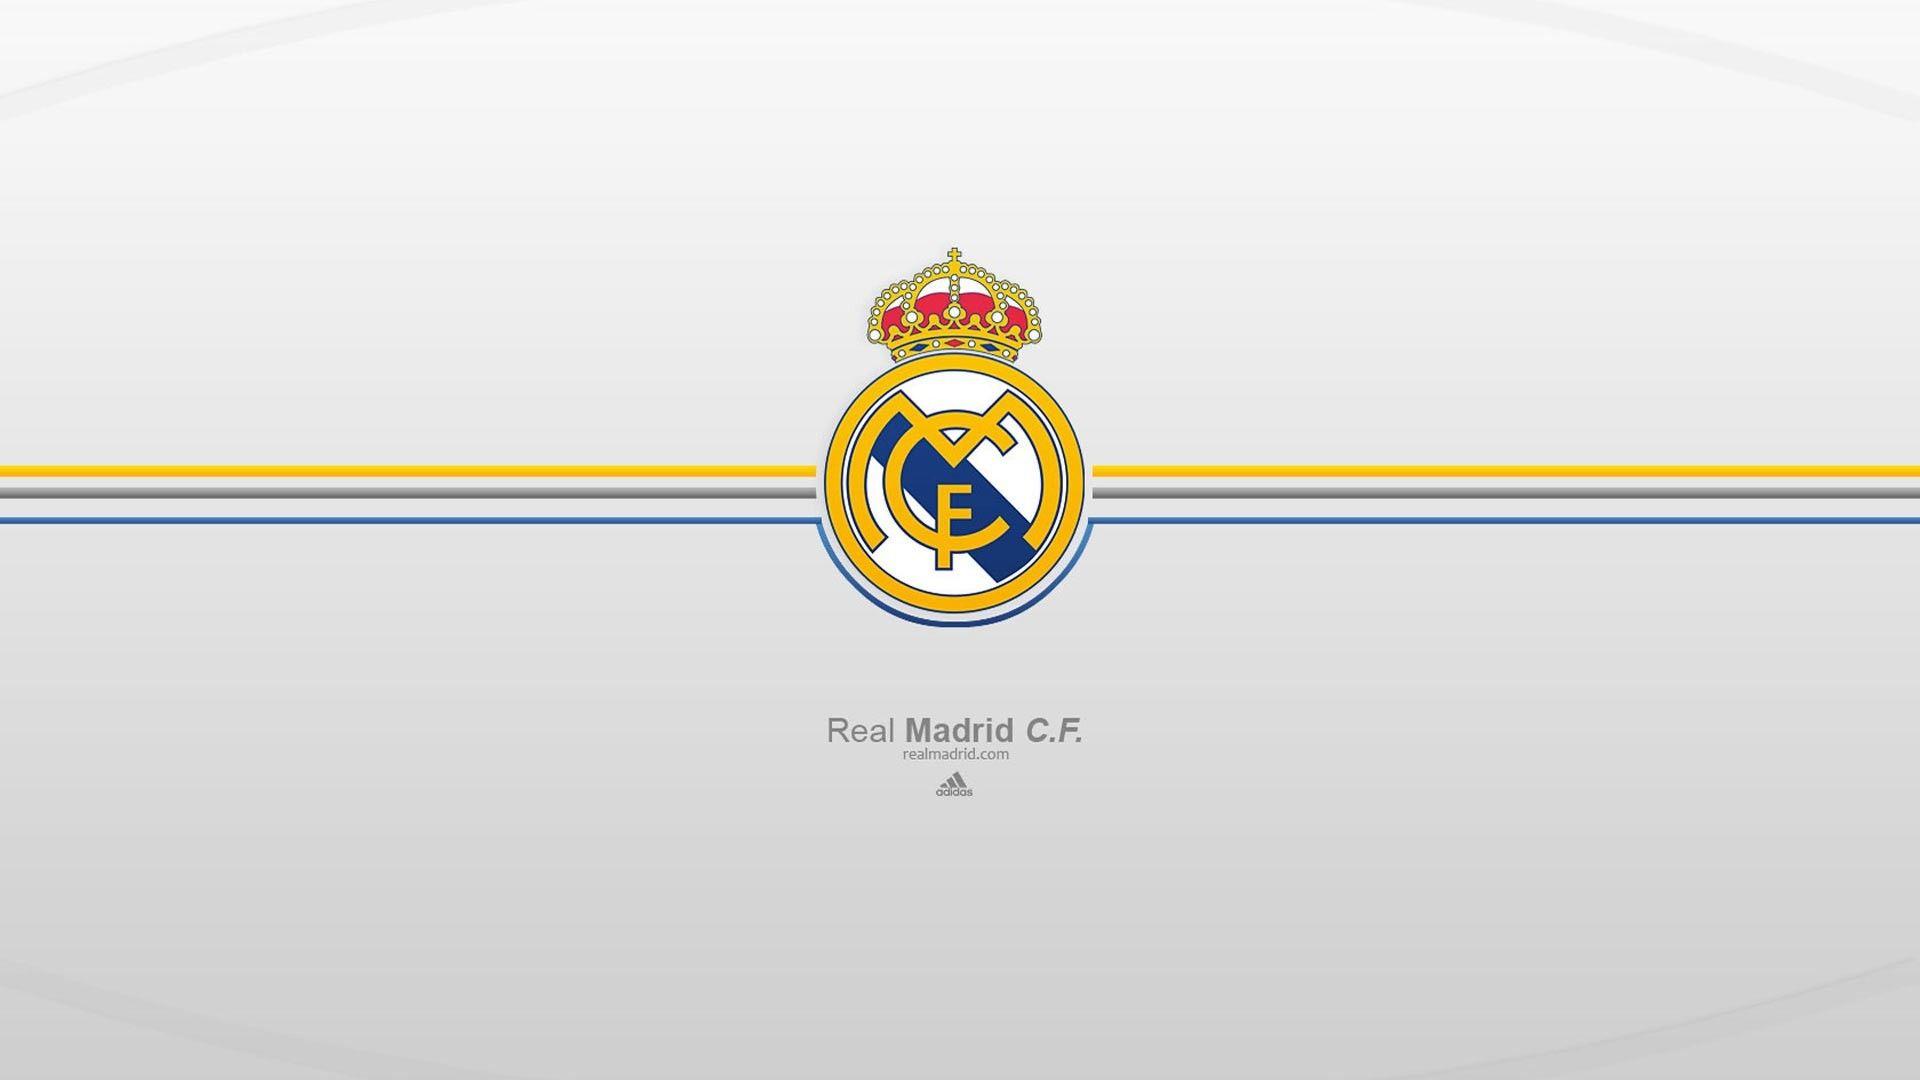 1920x1080 Real Madrid Logo Wallpaper Hd Widescreen Real Madrid Wallpapers Real Madrid Logo Wallpapers Madrid Wallpaper